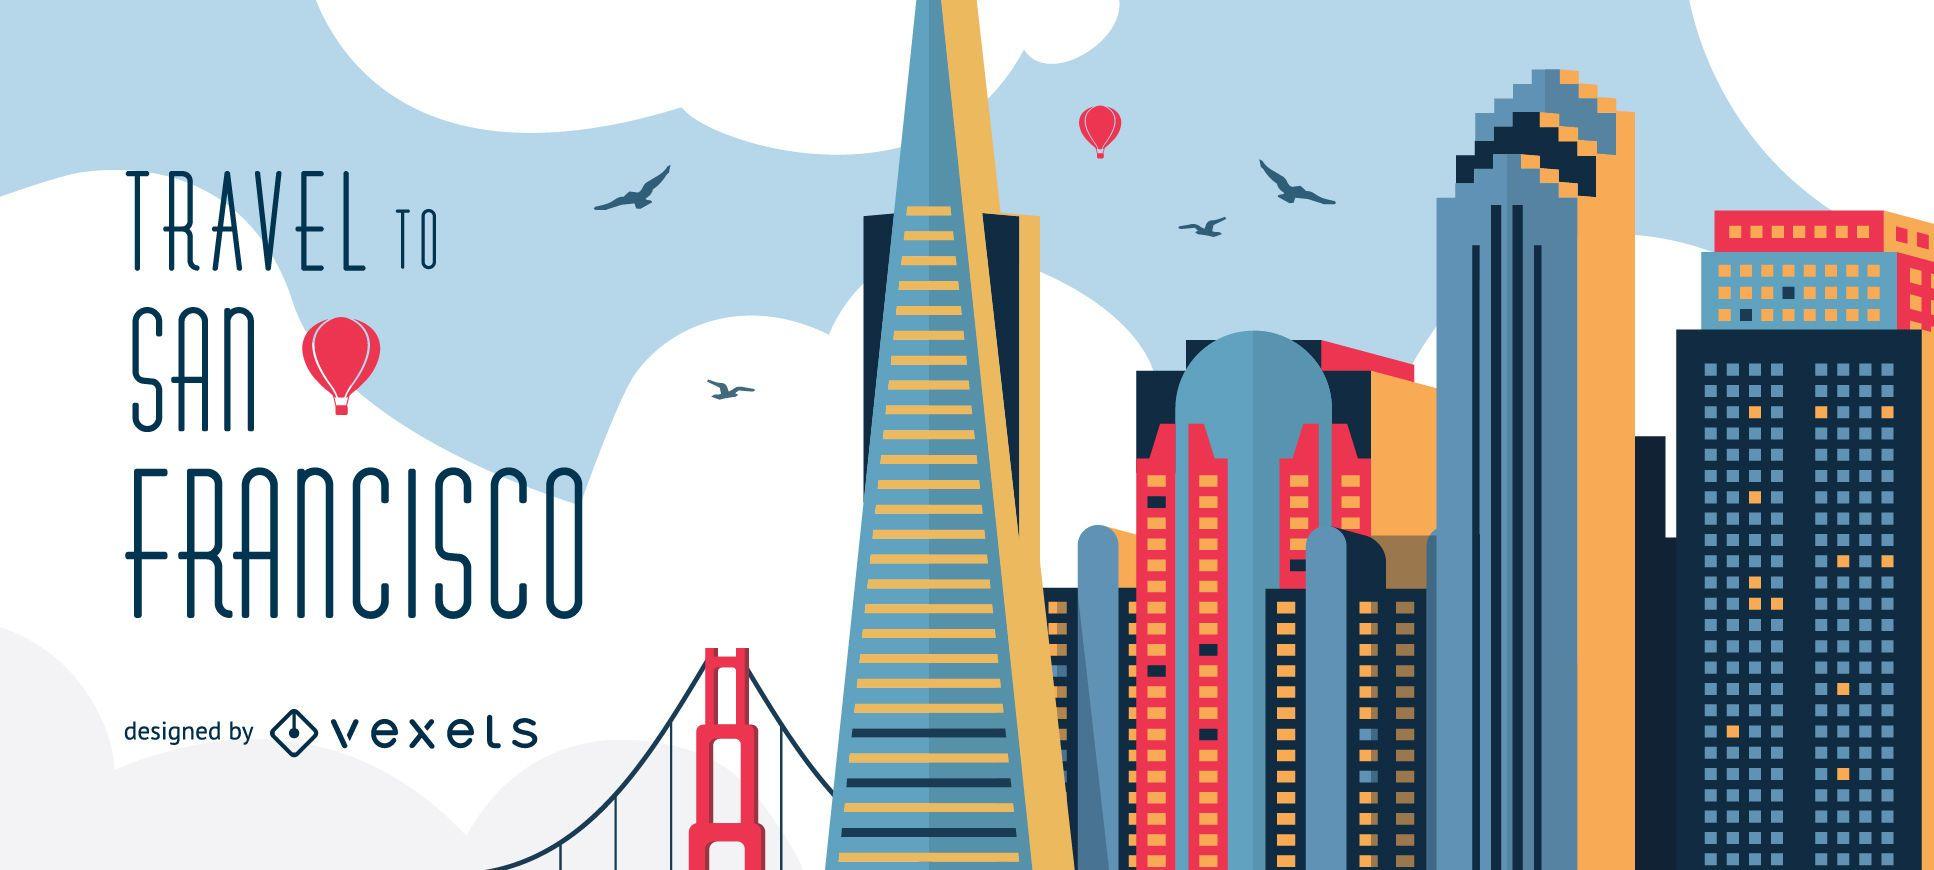 Travel to San Francisco skyline